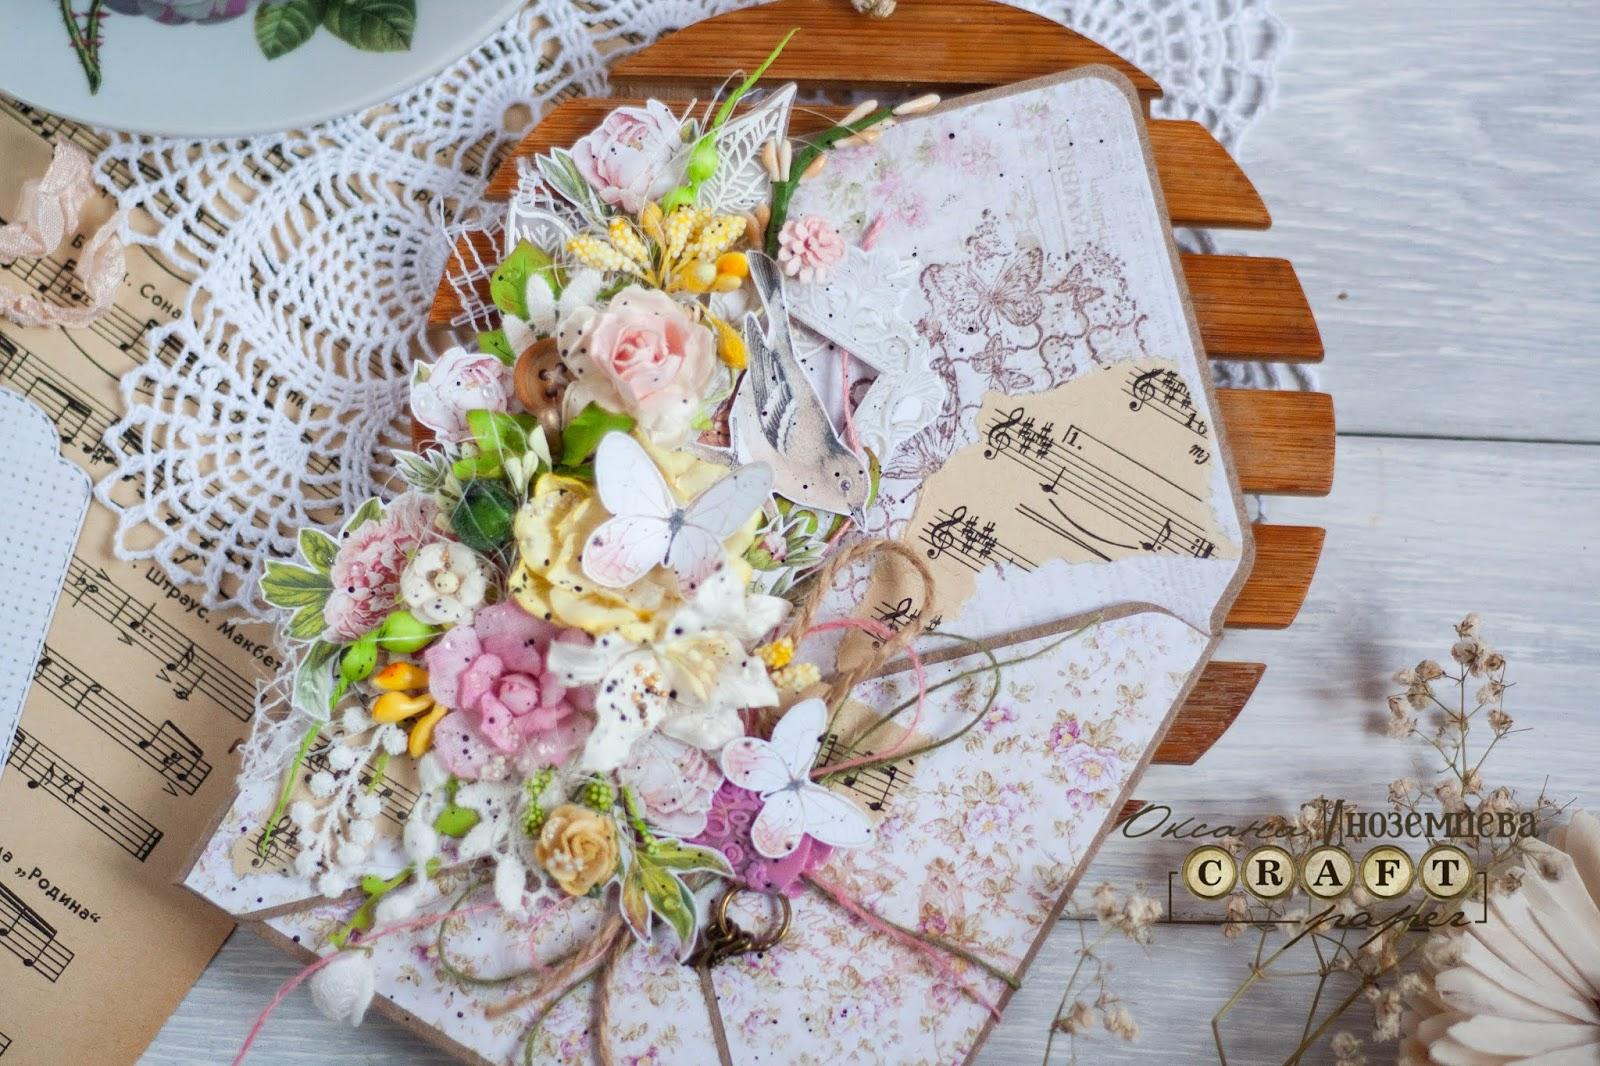 Фиалка сорт каменный цветок описание